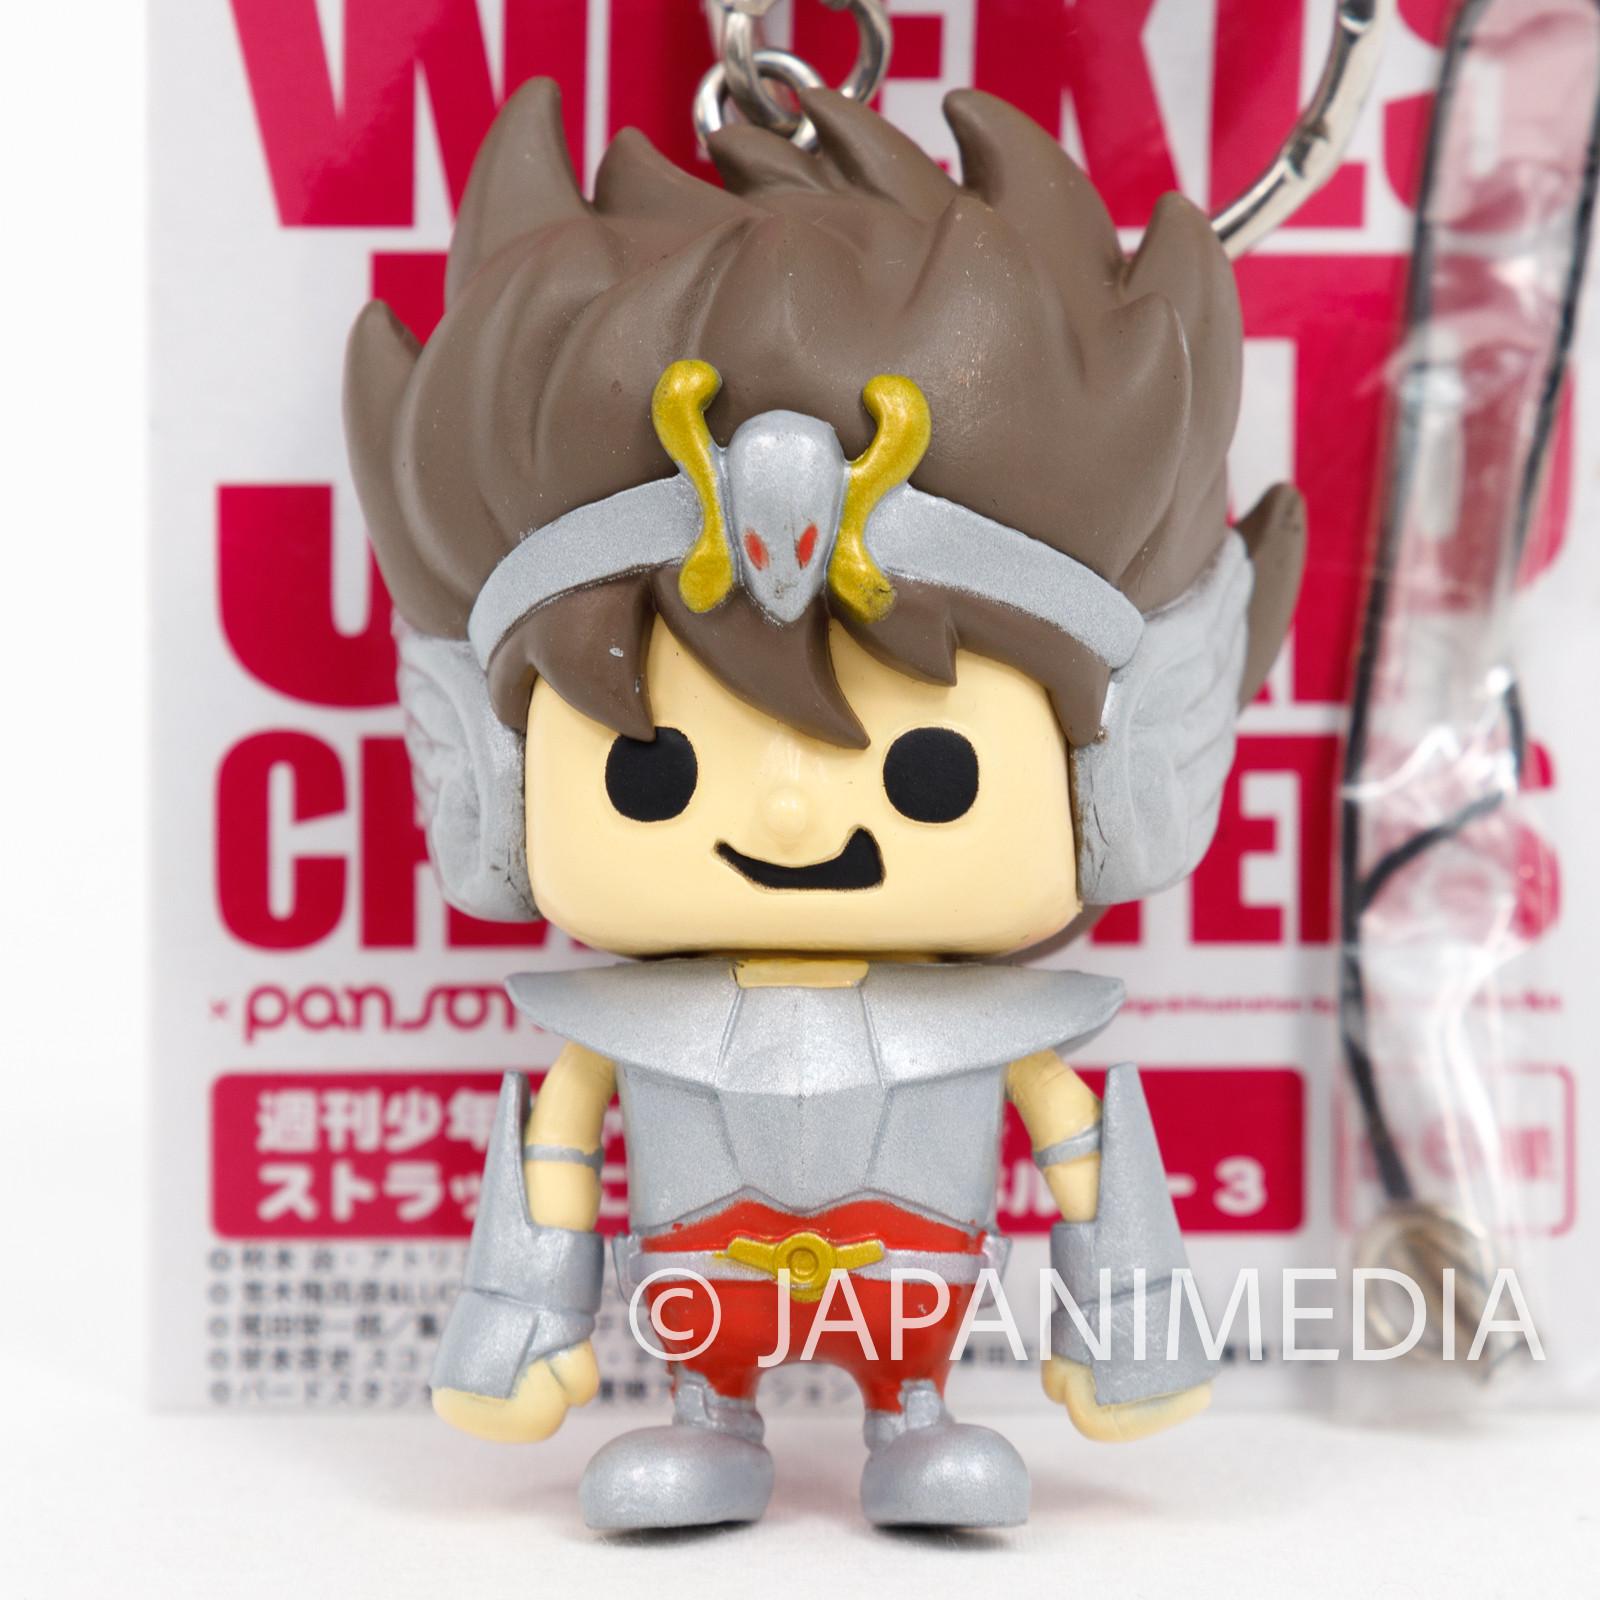 Saint Seiya Pegasus Seiya Panson Works Figure Key Chain JAPAN ANIME MANGA